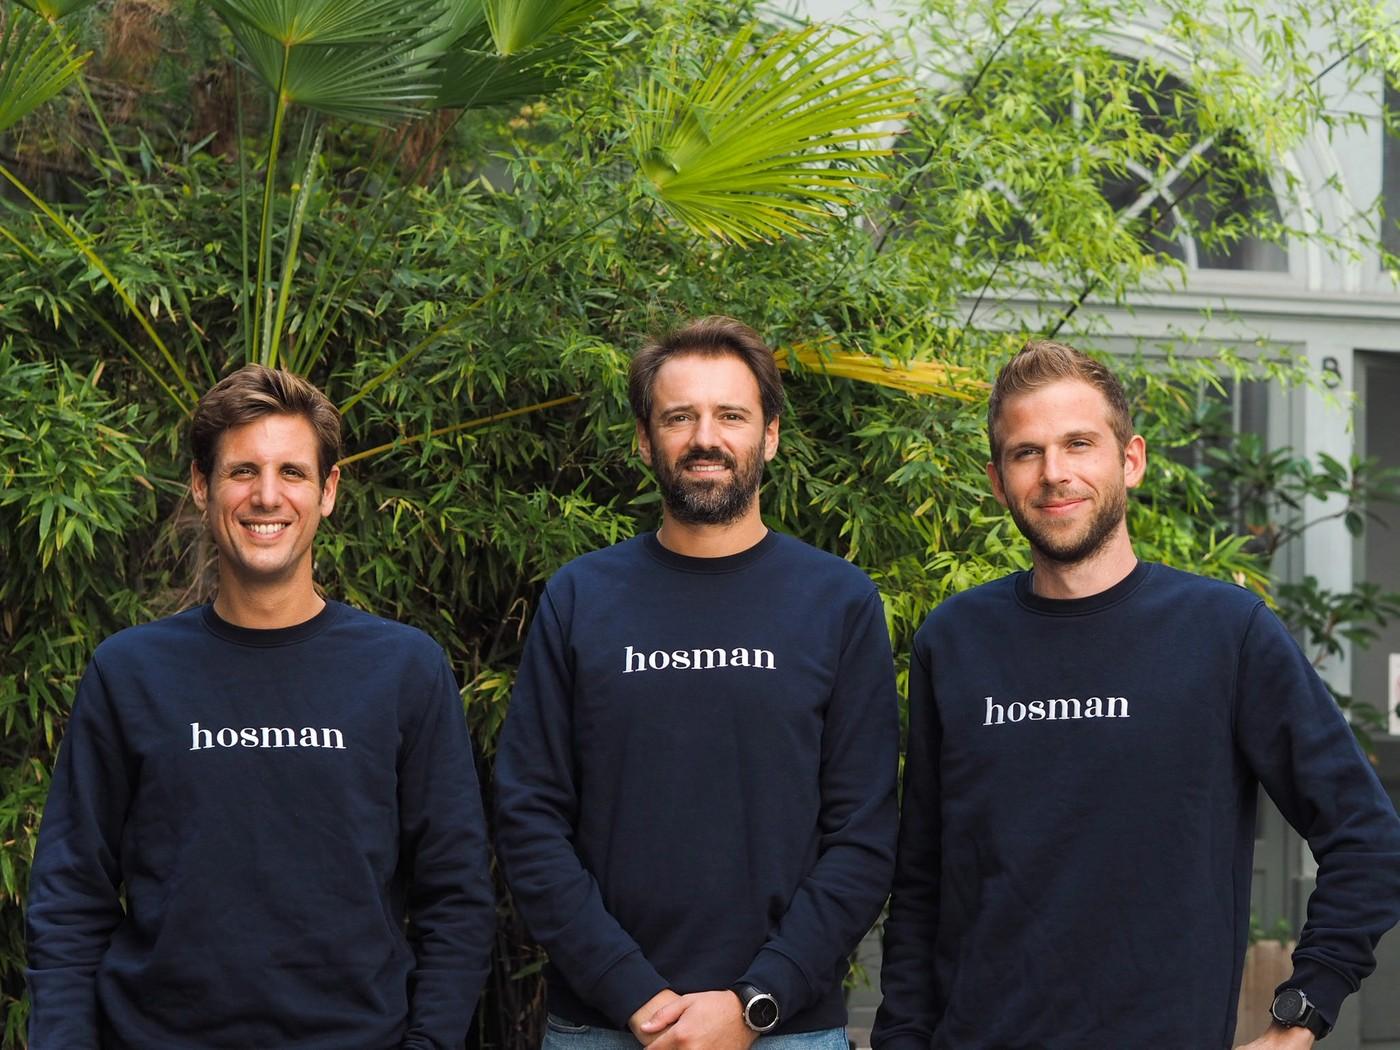 Les trois fondateurs de Hosman : Benjamin Bavuz, Paul-Henri Chopin et Stanislas de Dinechin